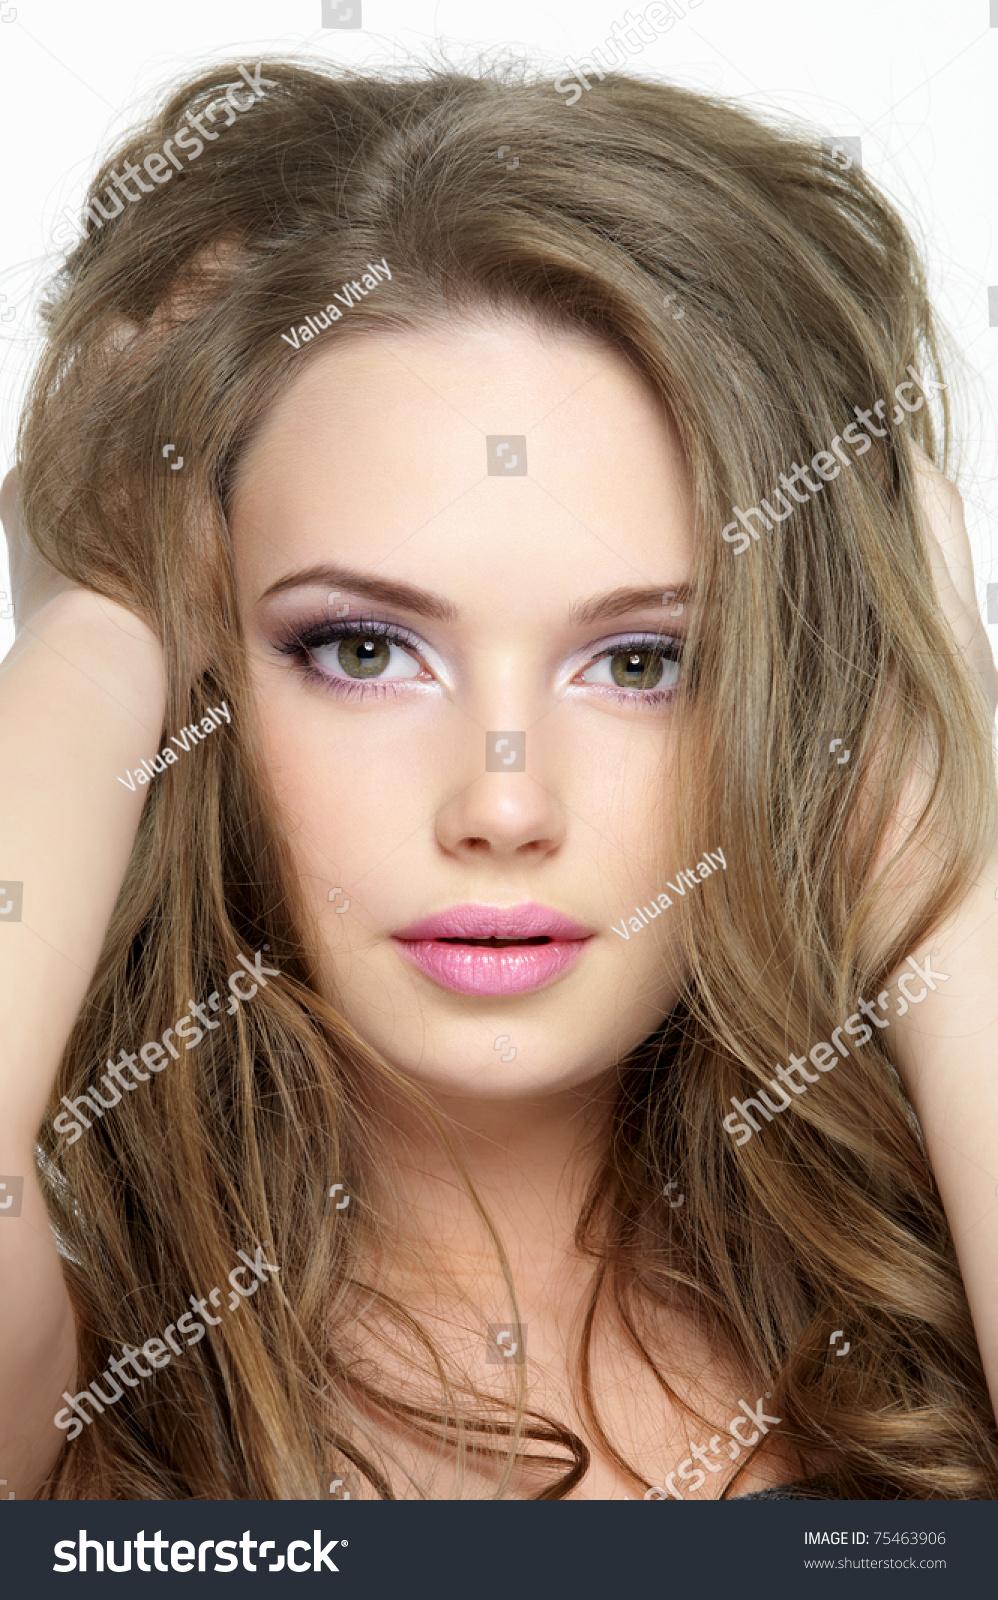 Closeup Portrait Of A: Closeup Portrait Of Beautiful Pretty Face Of Young Girl